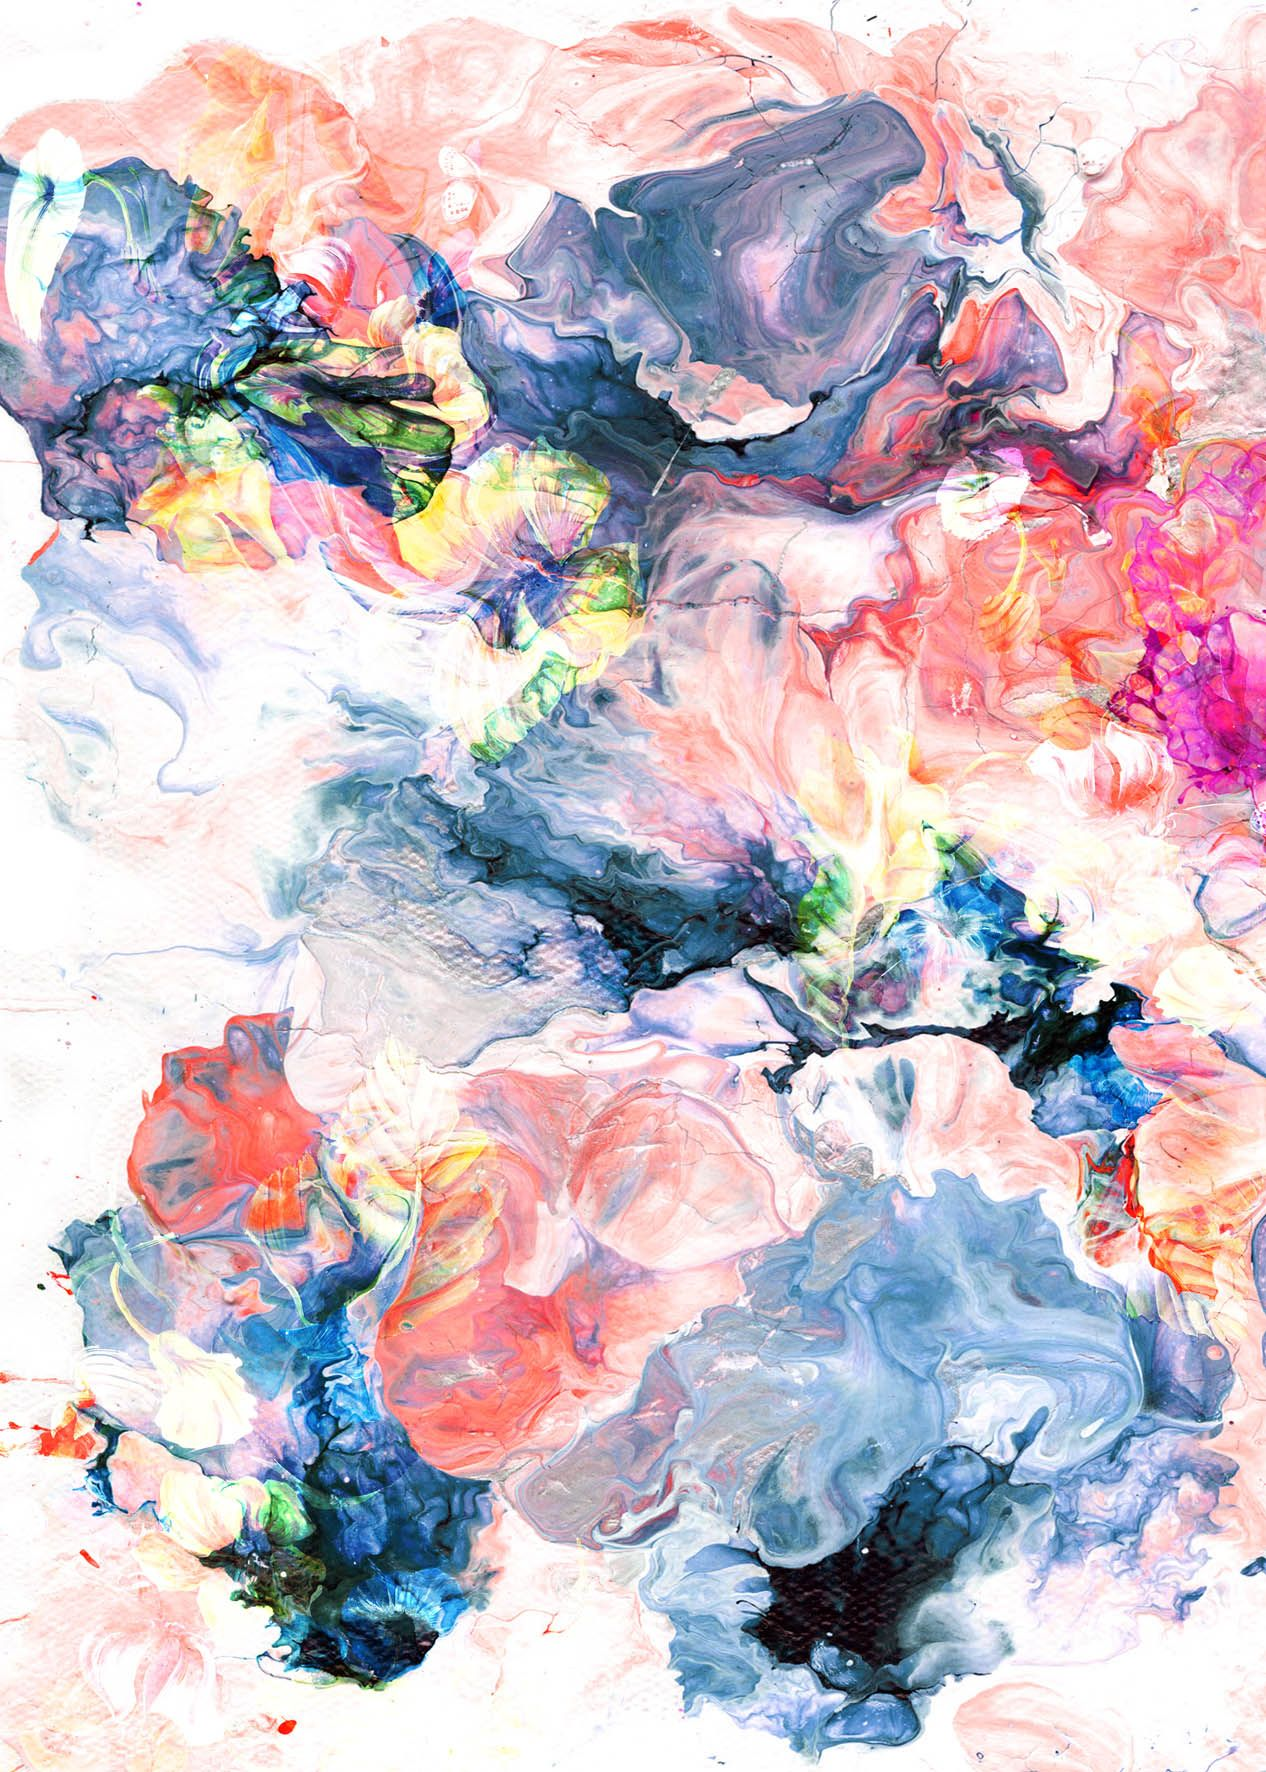 Top Wallpaper Marble Painting - 7d315ea5691371e6bb311cec8e409216  Pictures_463097.jpg